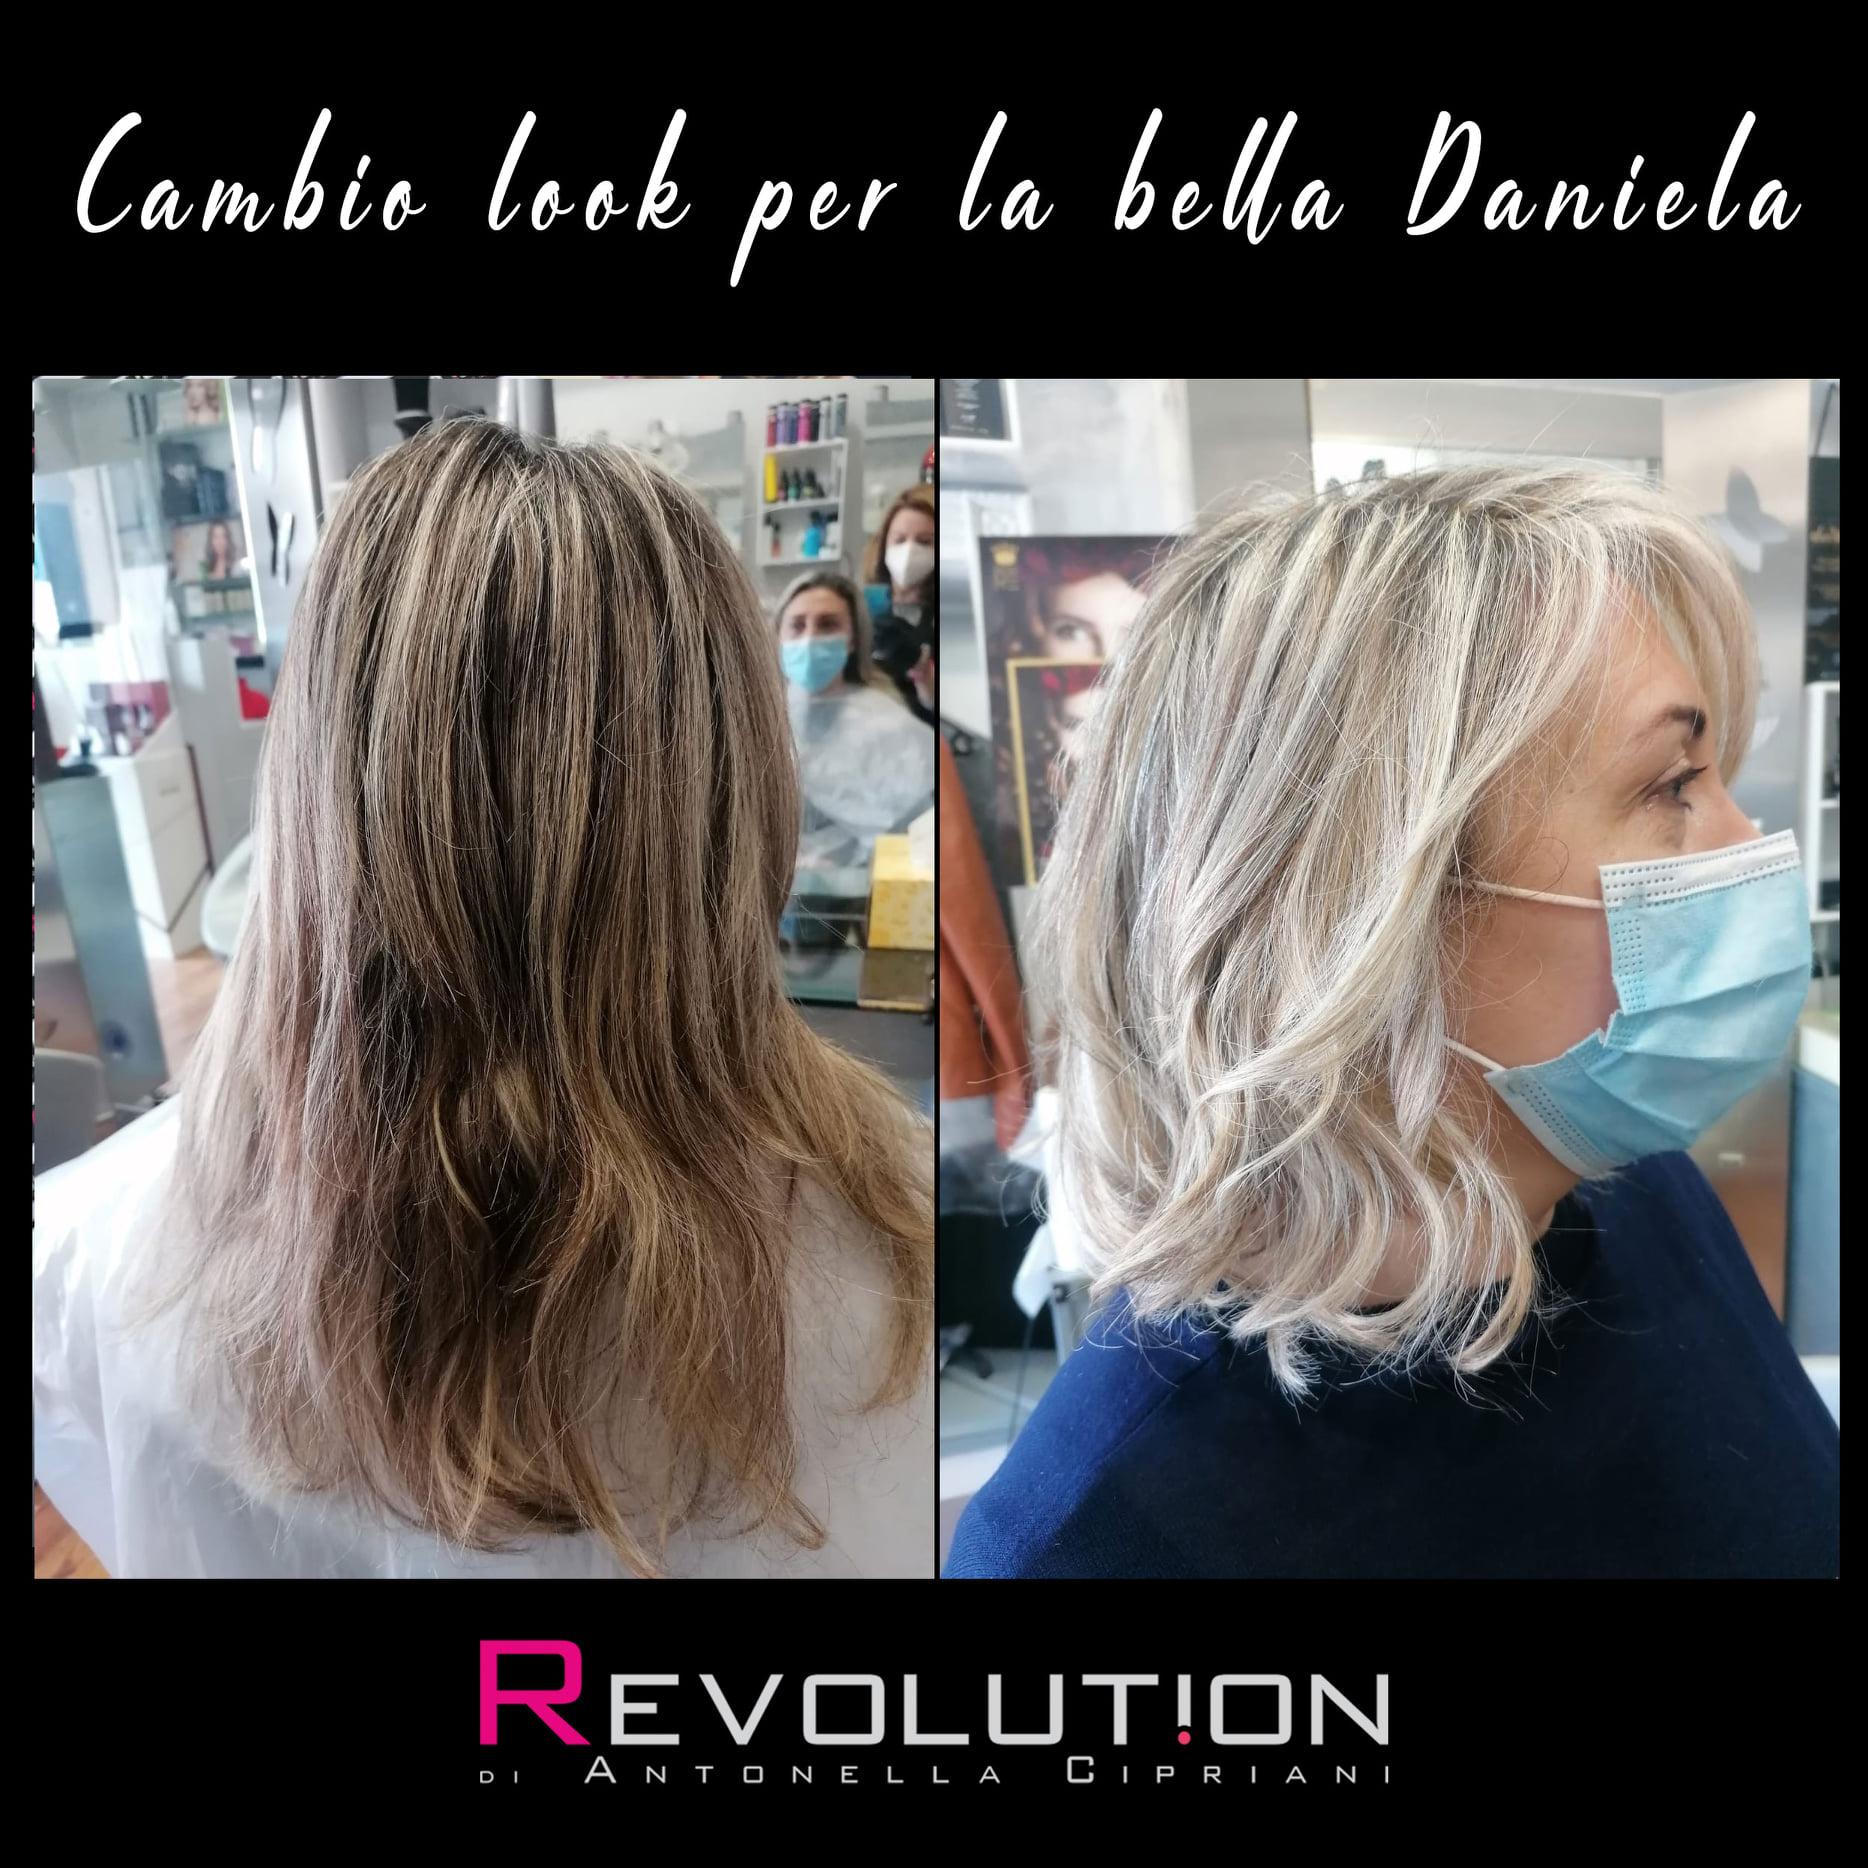 Cambio look per la bella Daniela